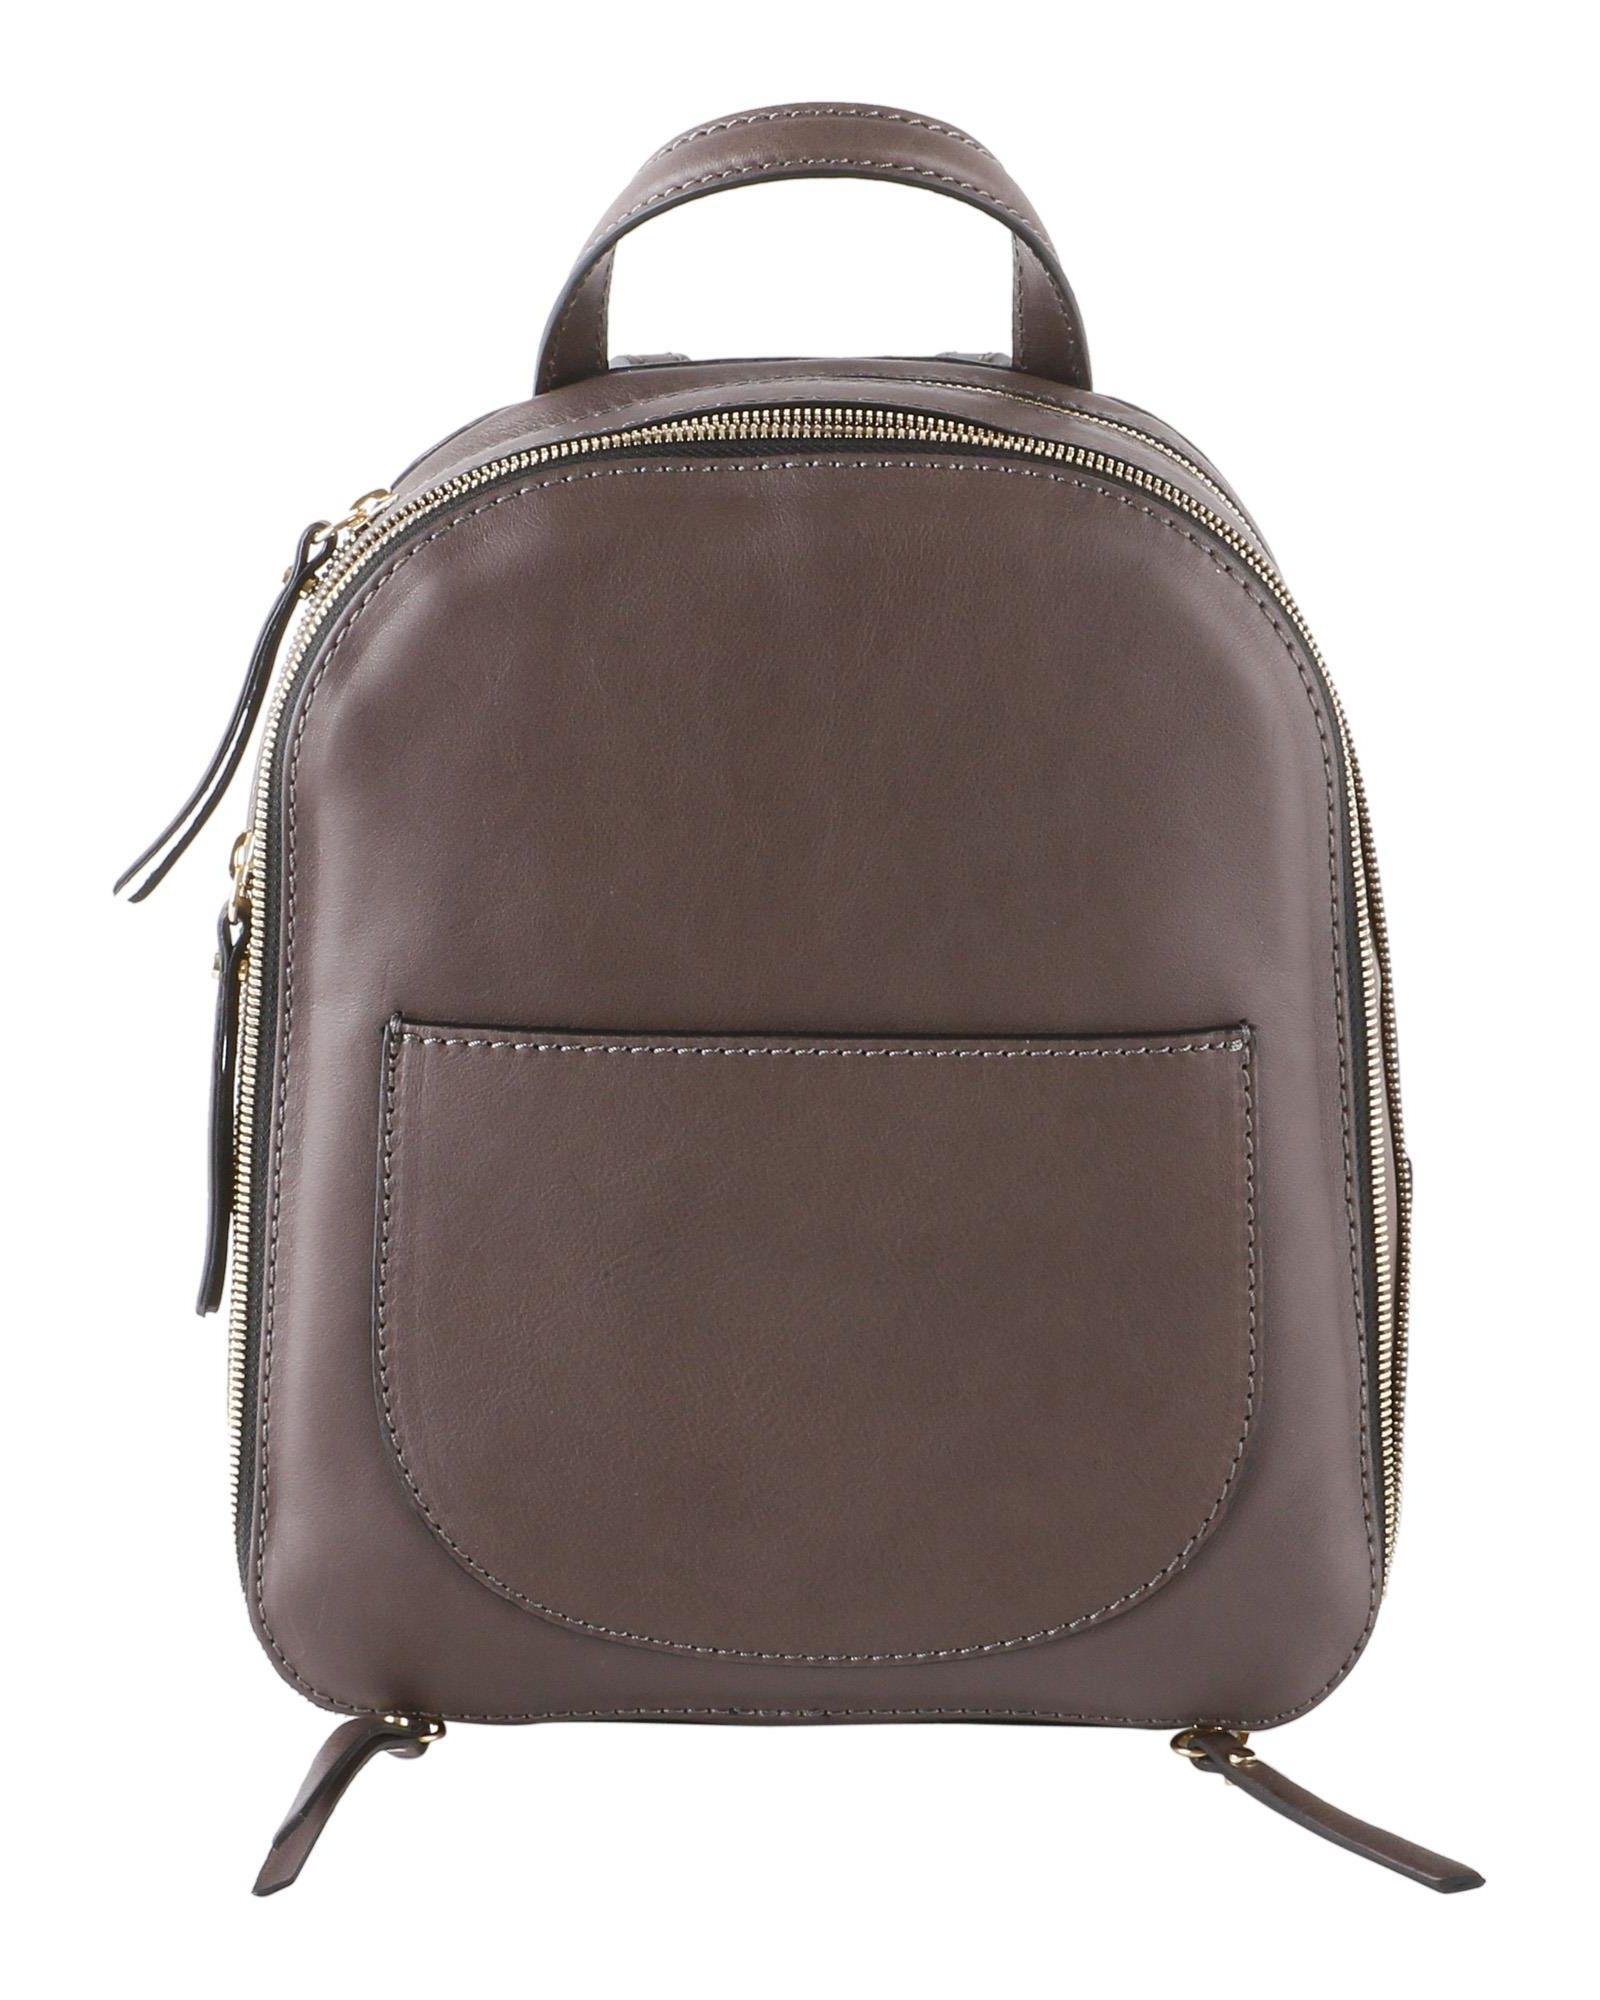 GIANNI CHIARINI Saffiano Leather Backpack in Brown